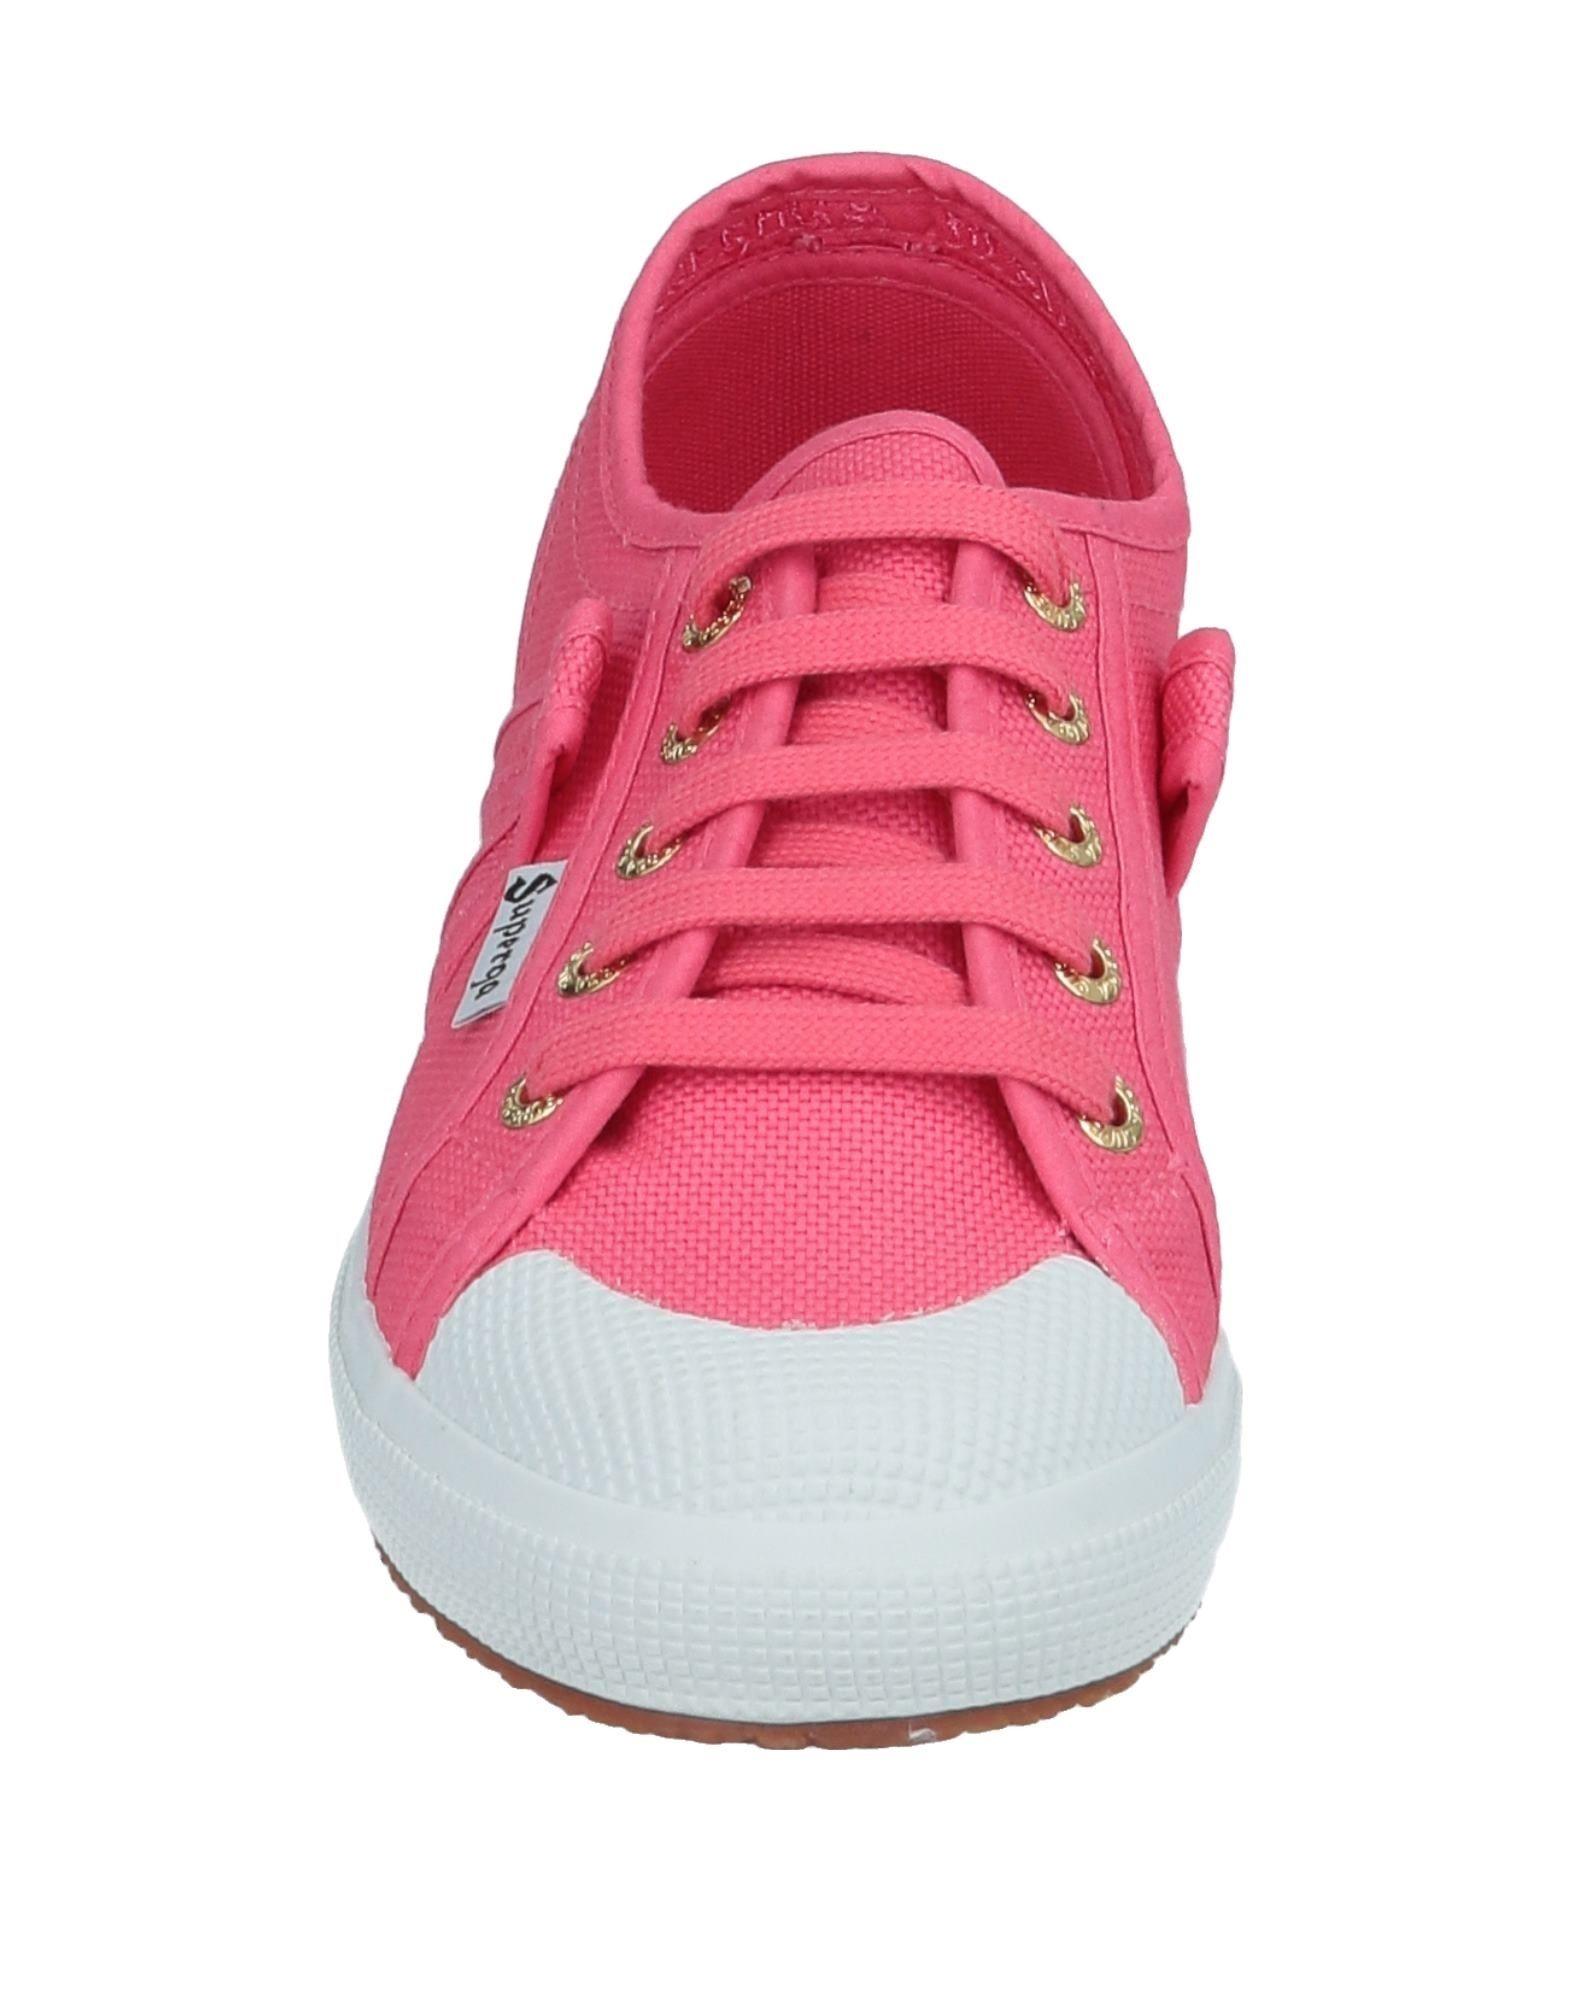 Superga® Sneakers Damen  beliebte 11546513CA Gute Qualität beliebte  Schuhe 943963